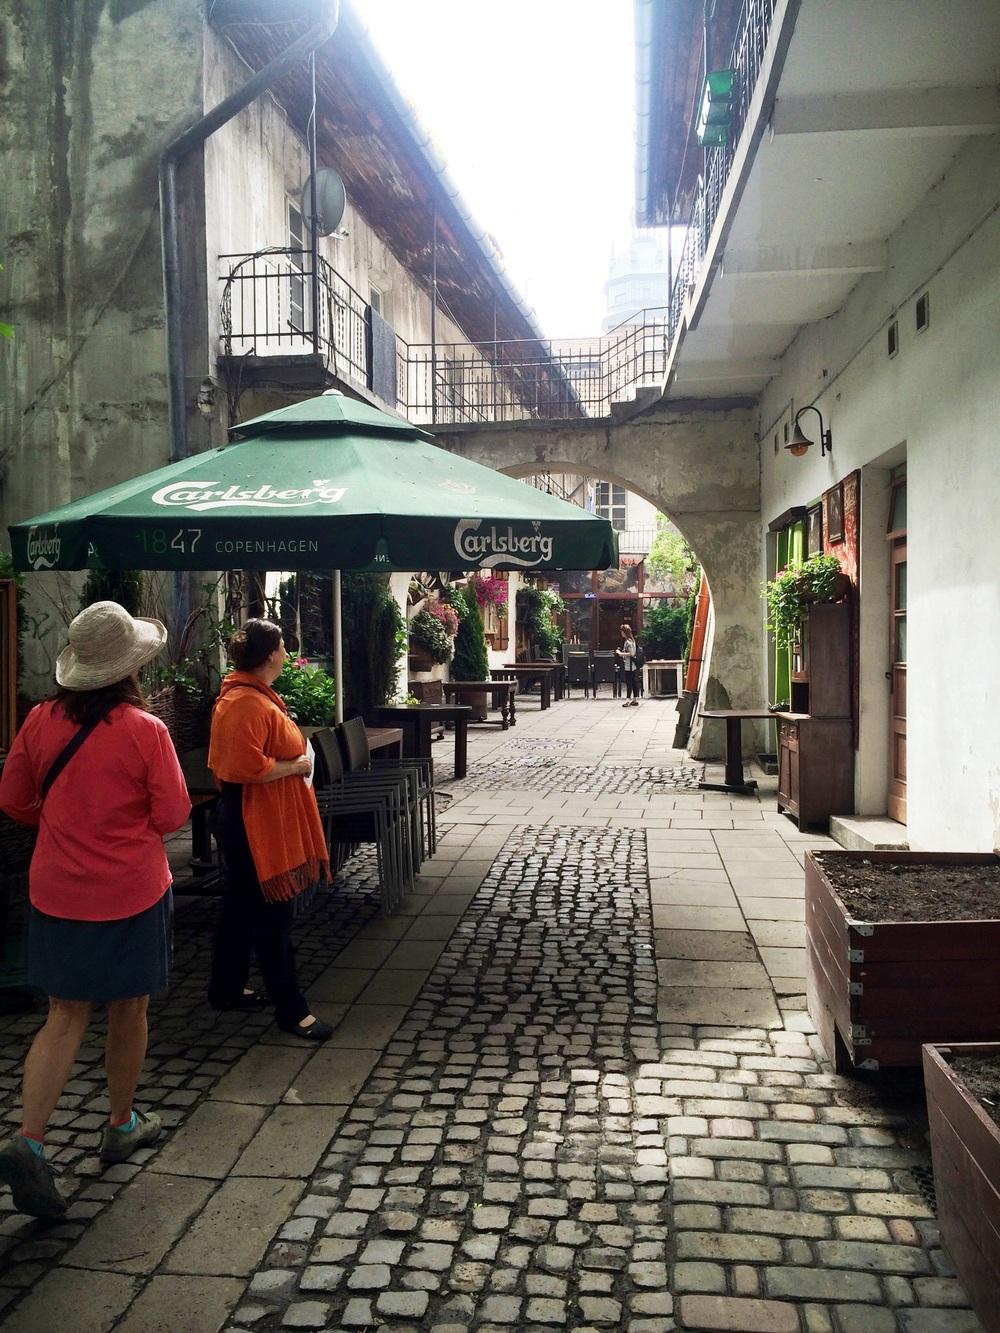 Part of Schindler's List was filmed here